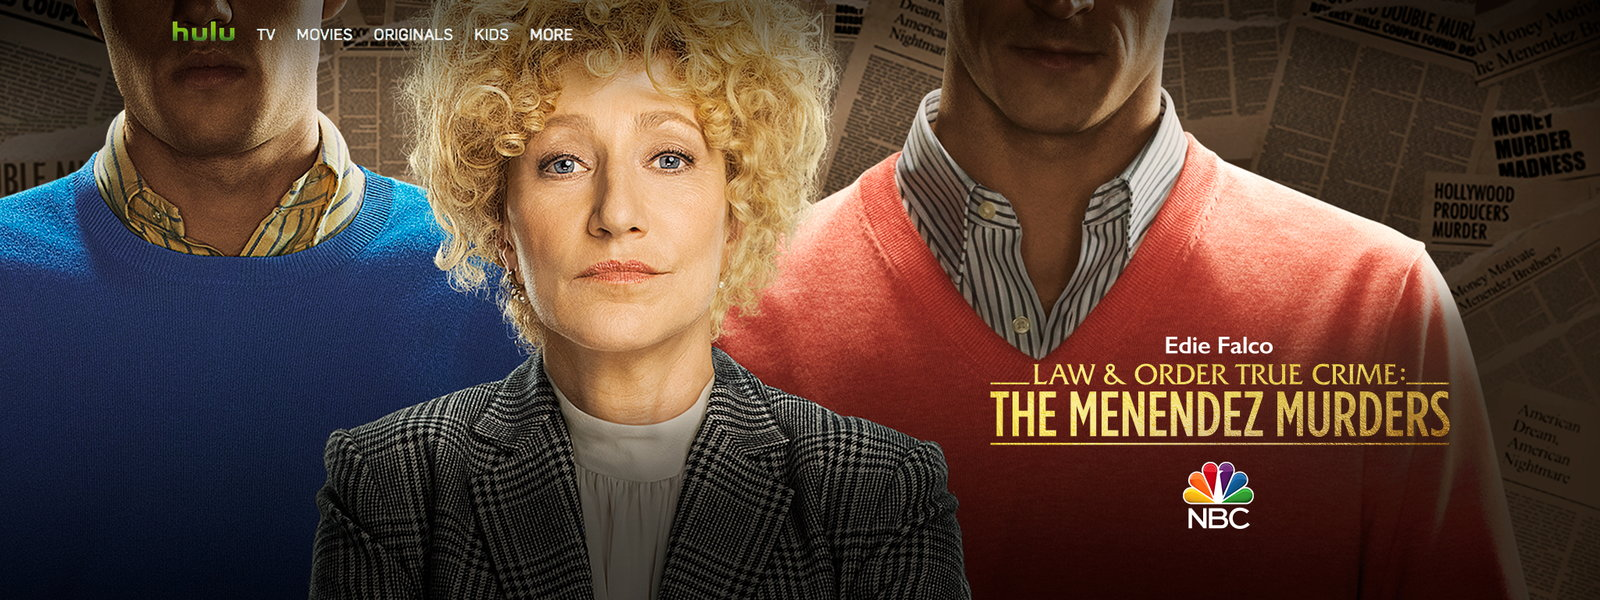 Watch Law & Order True Crime: The Menendez Murders Online at Hulu